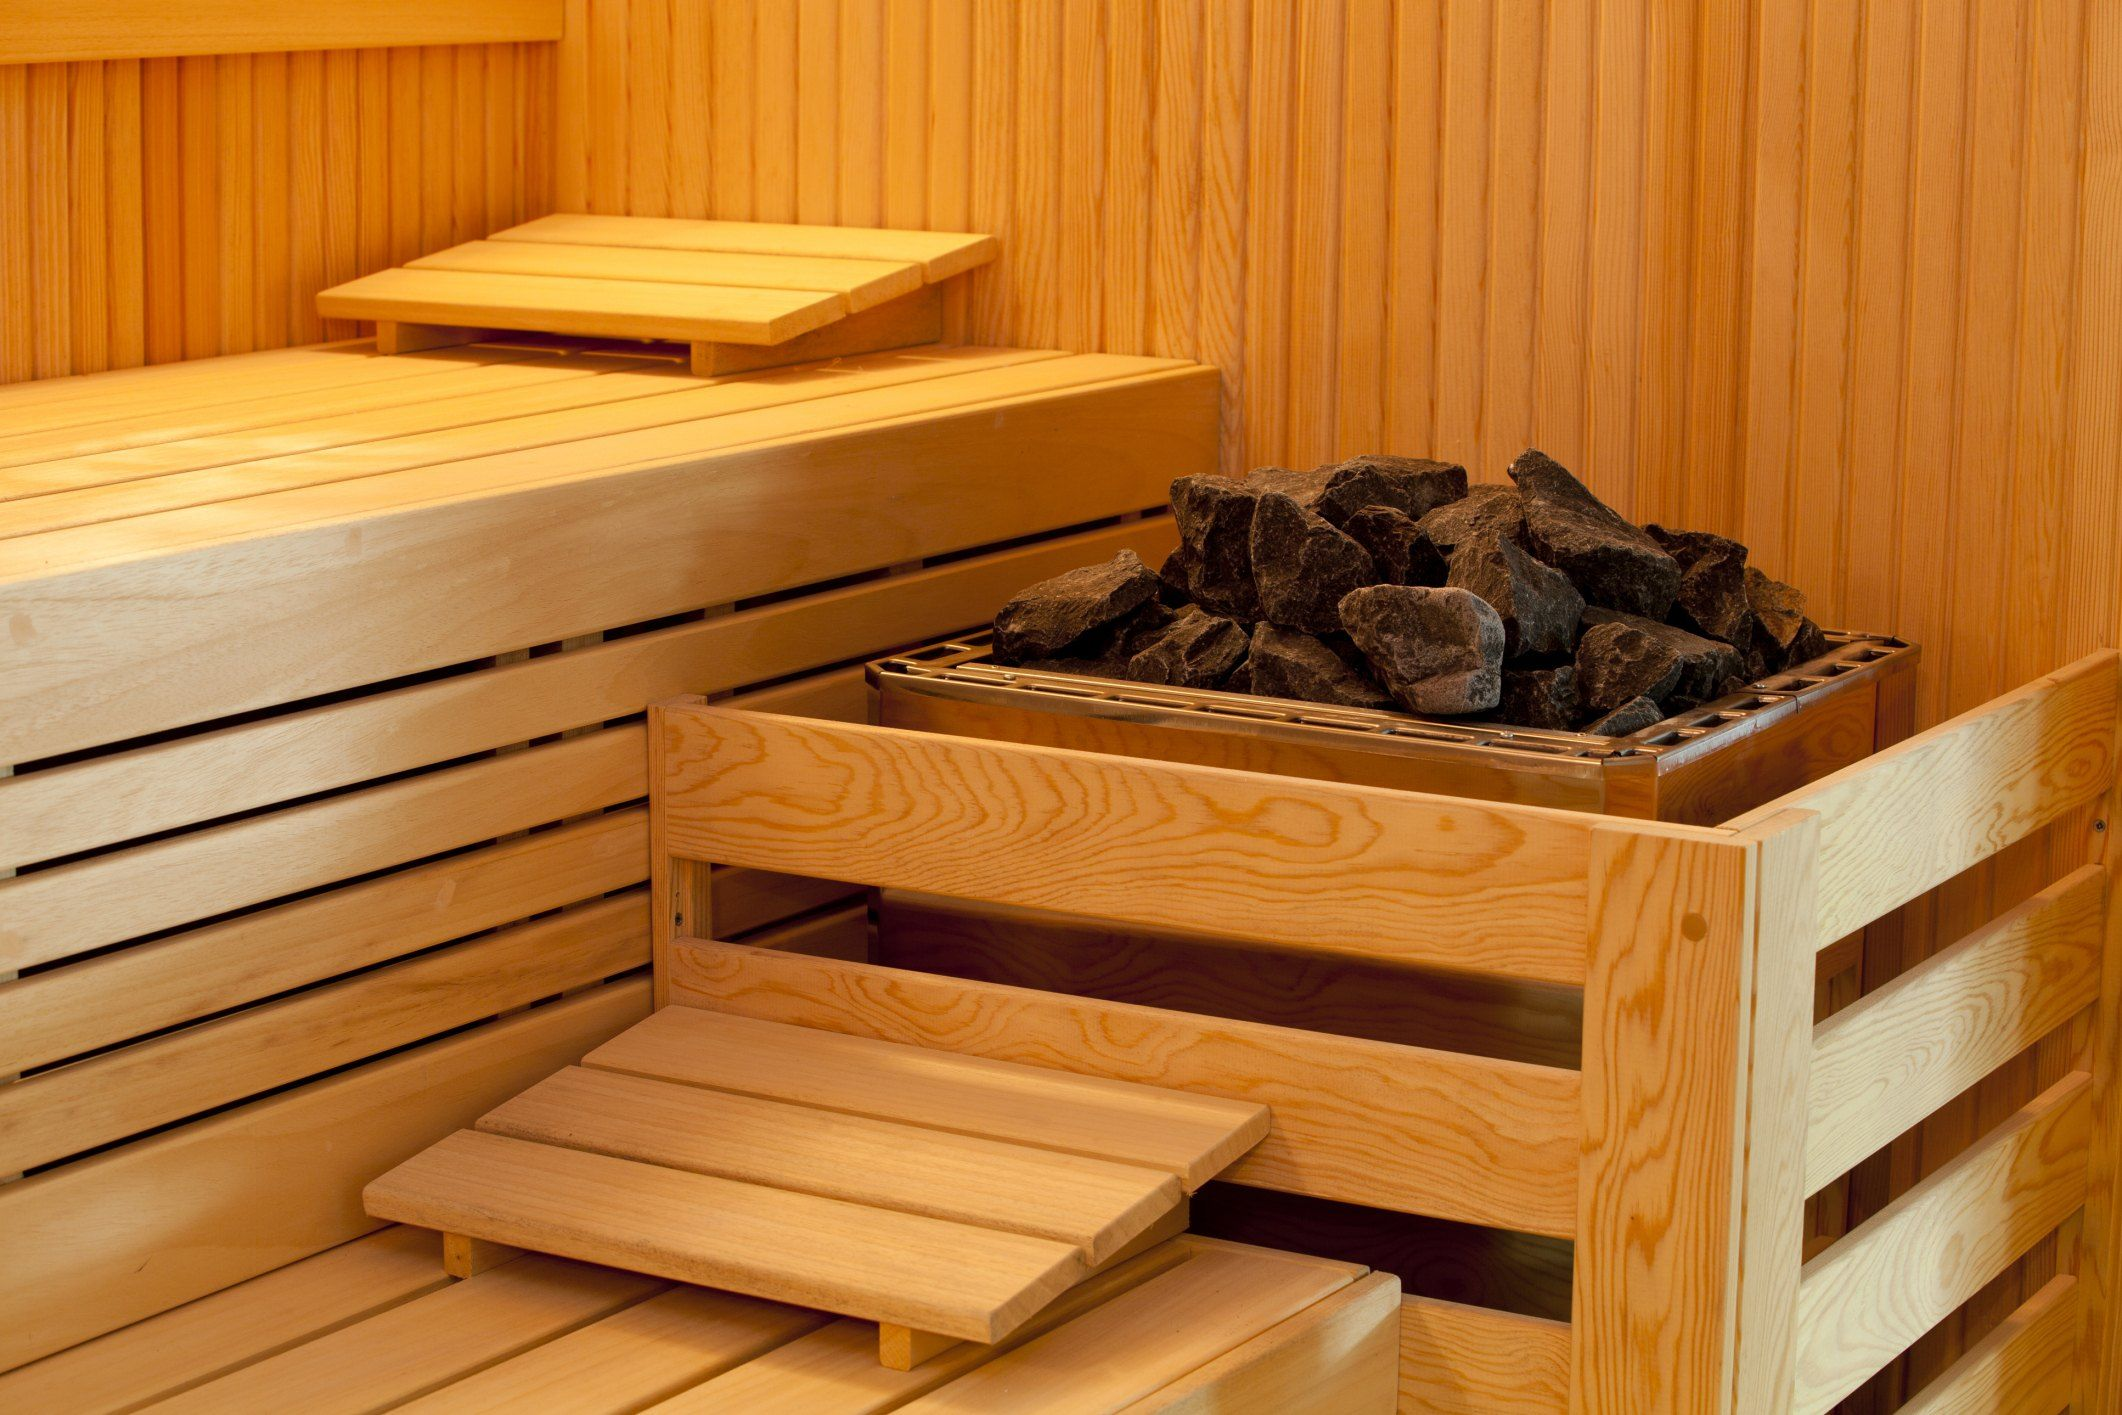 Sauna Vs Steam Room With Images Steam Room Sauna Steam Room